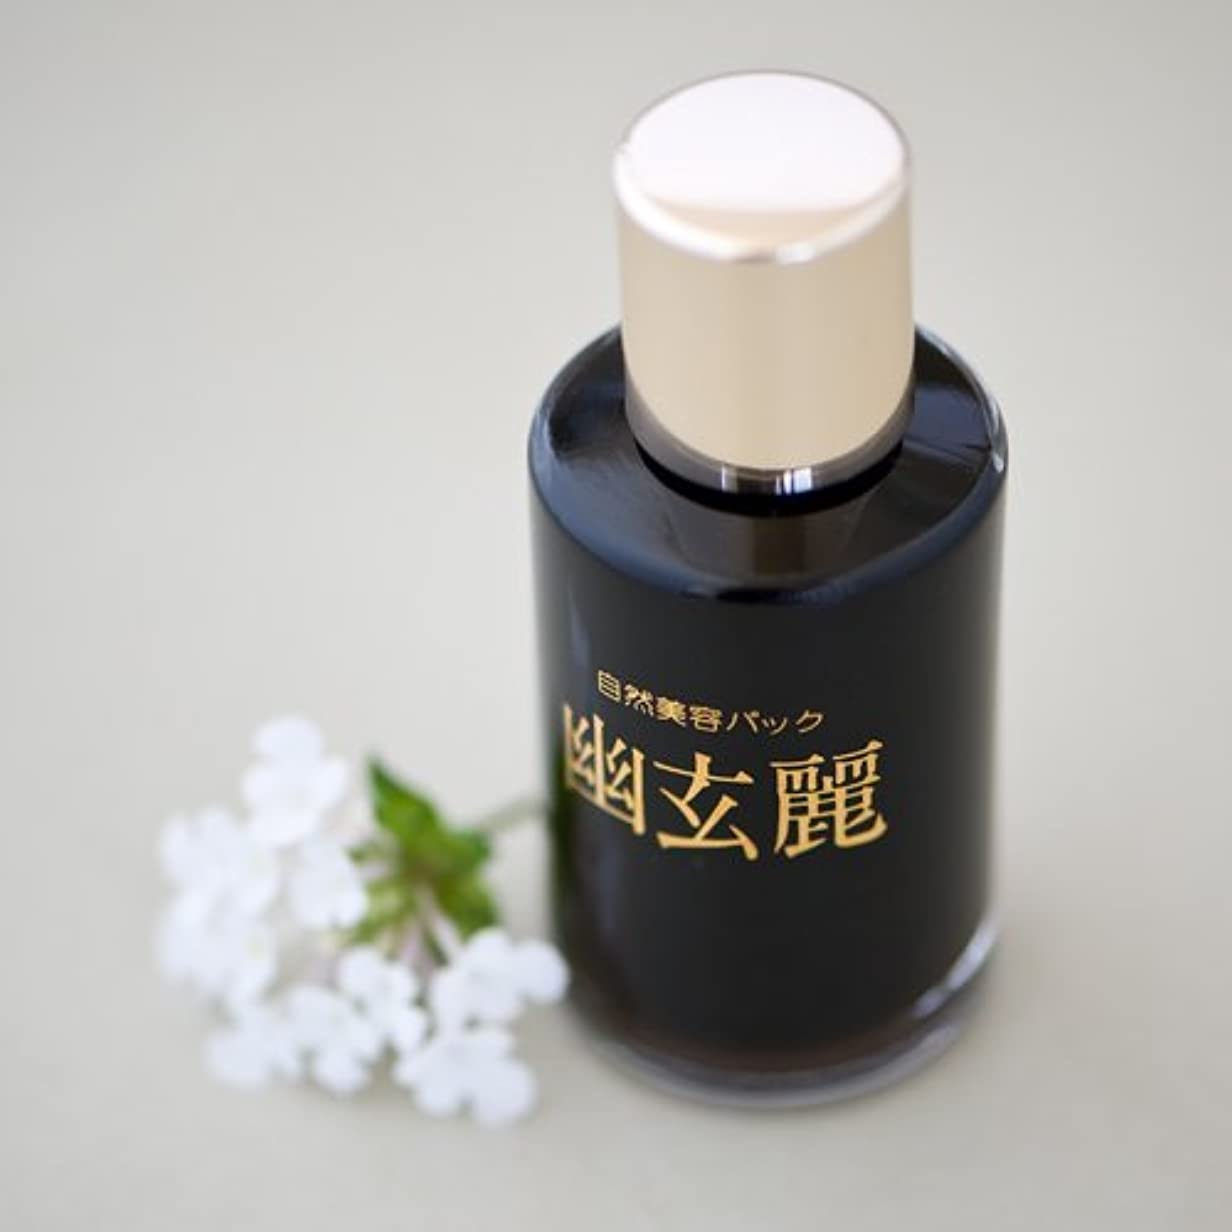 解説頭痛精査する漢萌(KANPOO) 幽玄麗(活肌美容液) 30ml